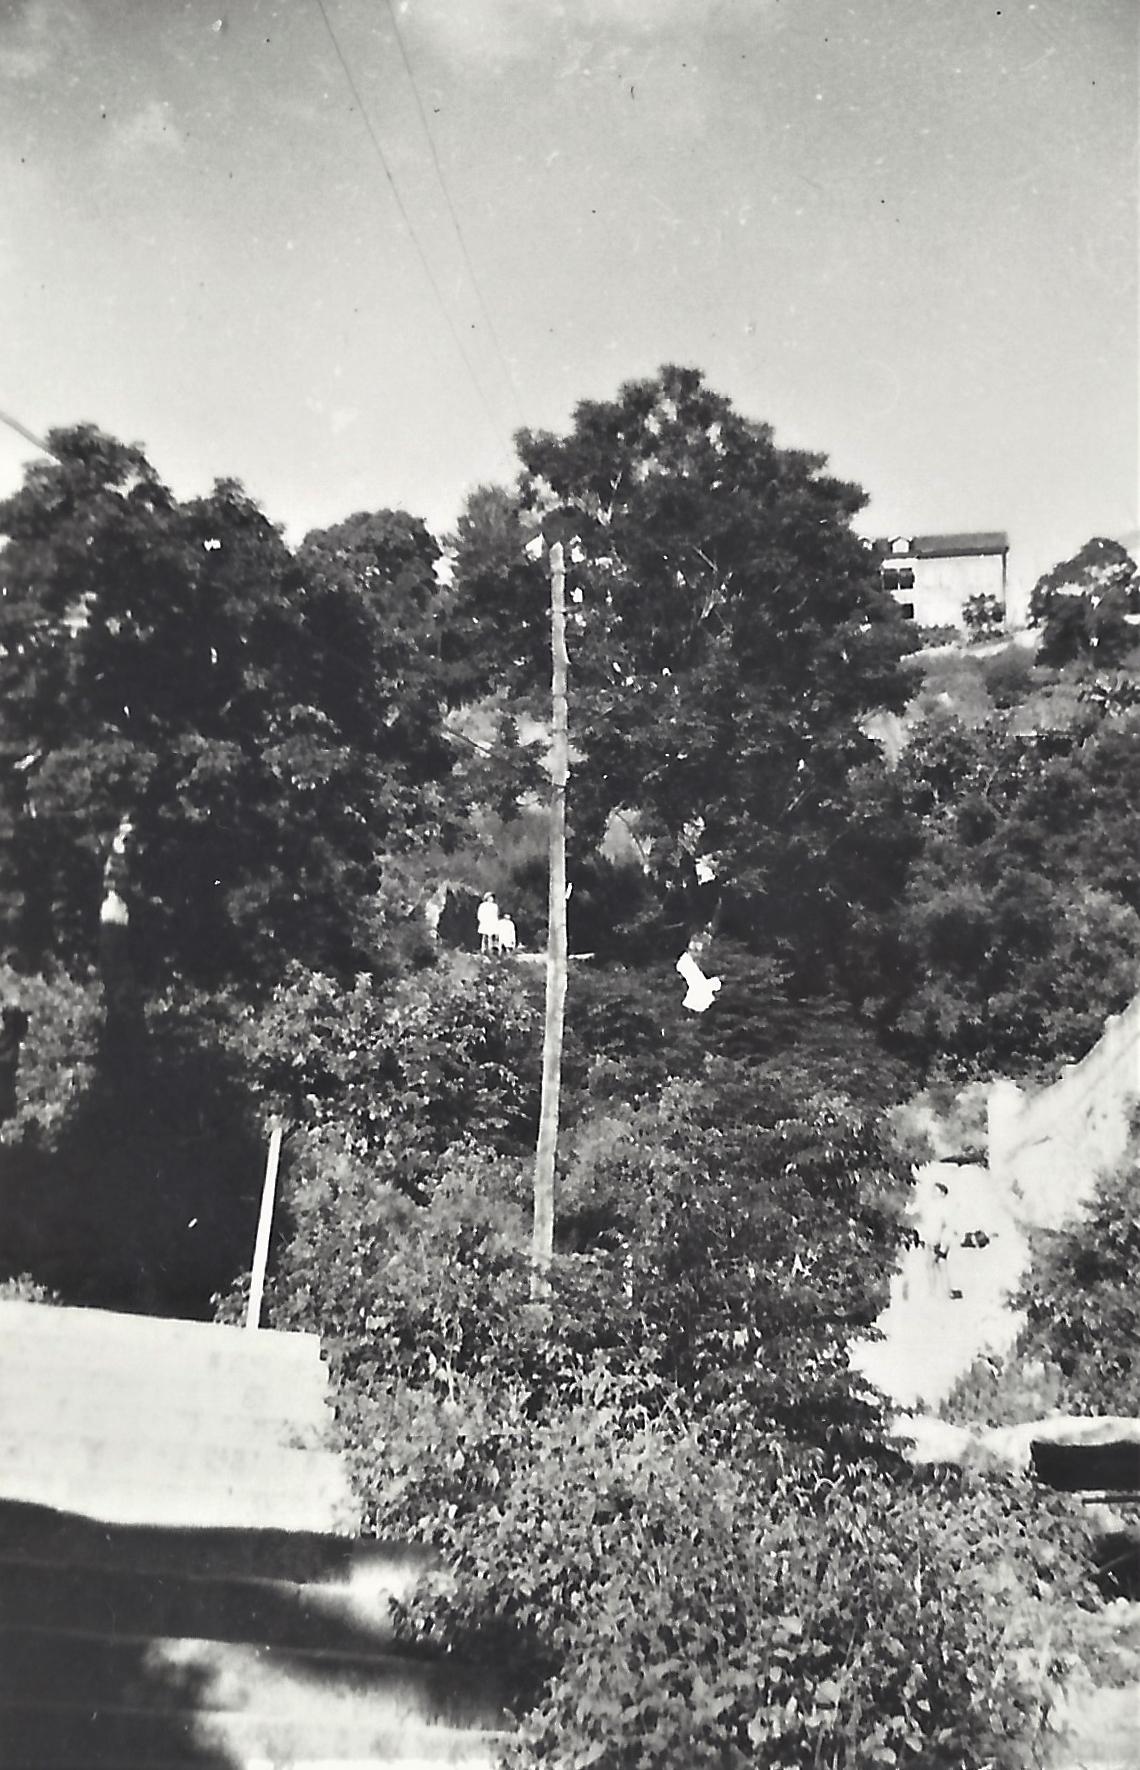 Environ du Palais de la Reine, Tananarive.